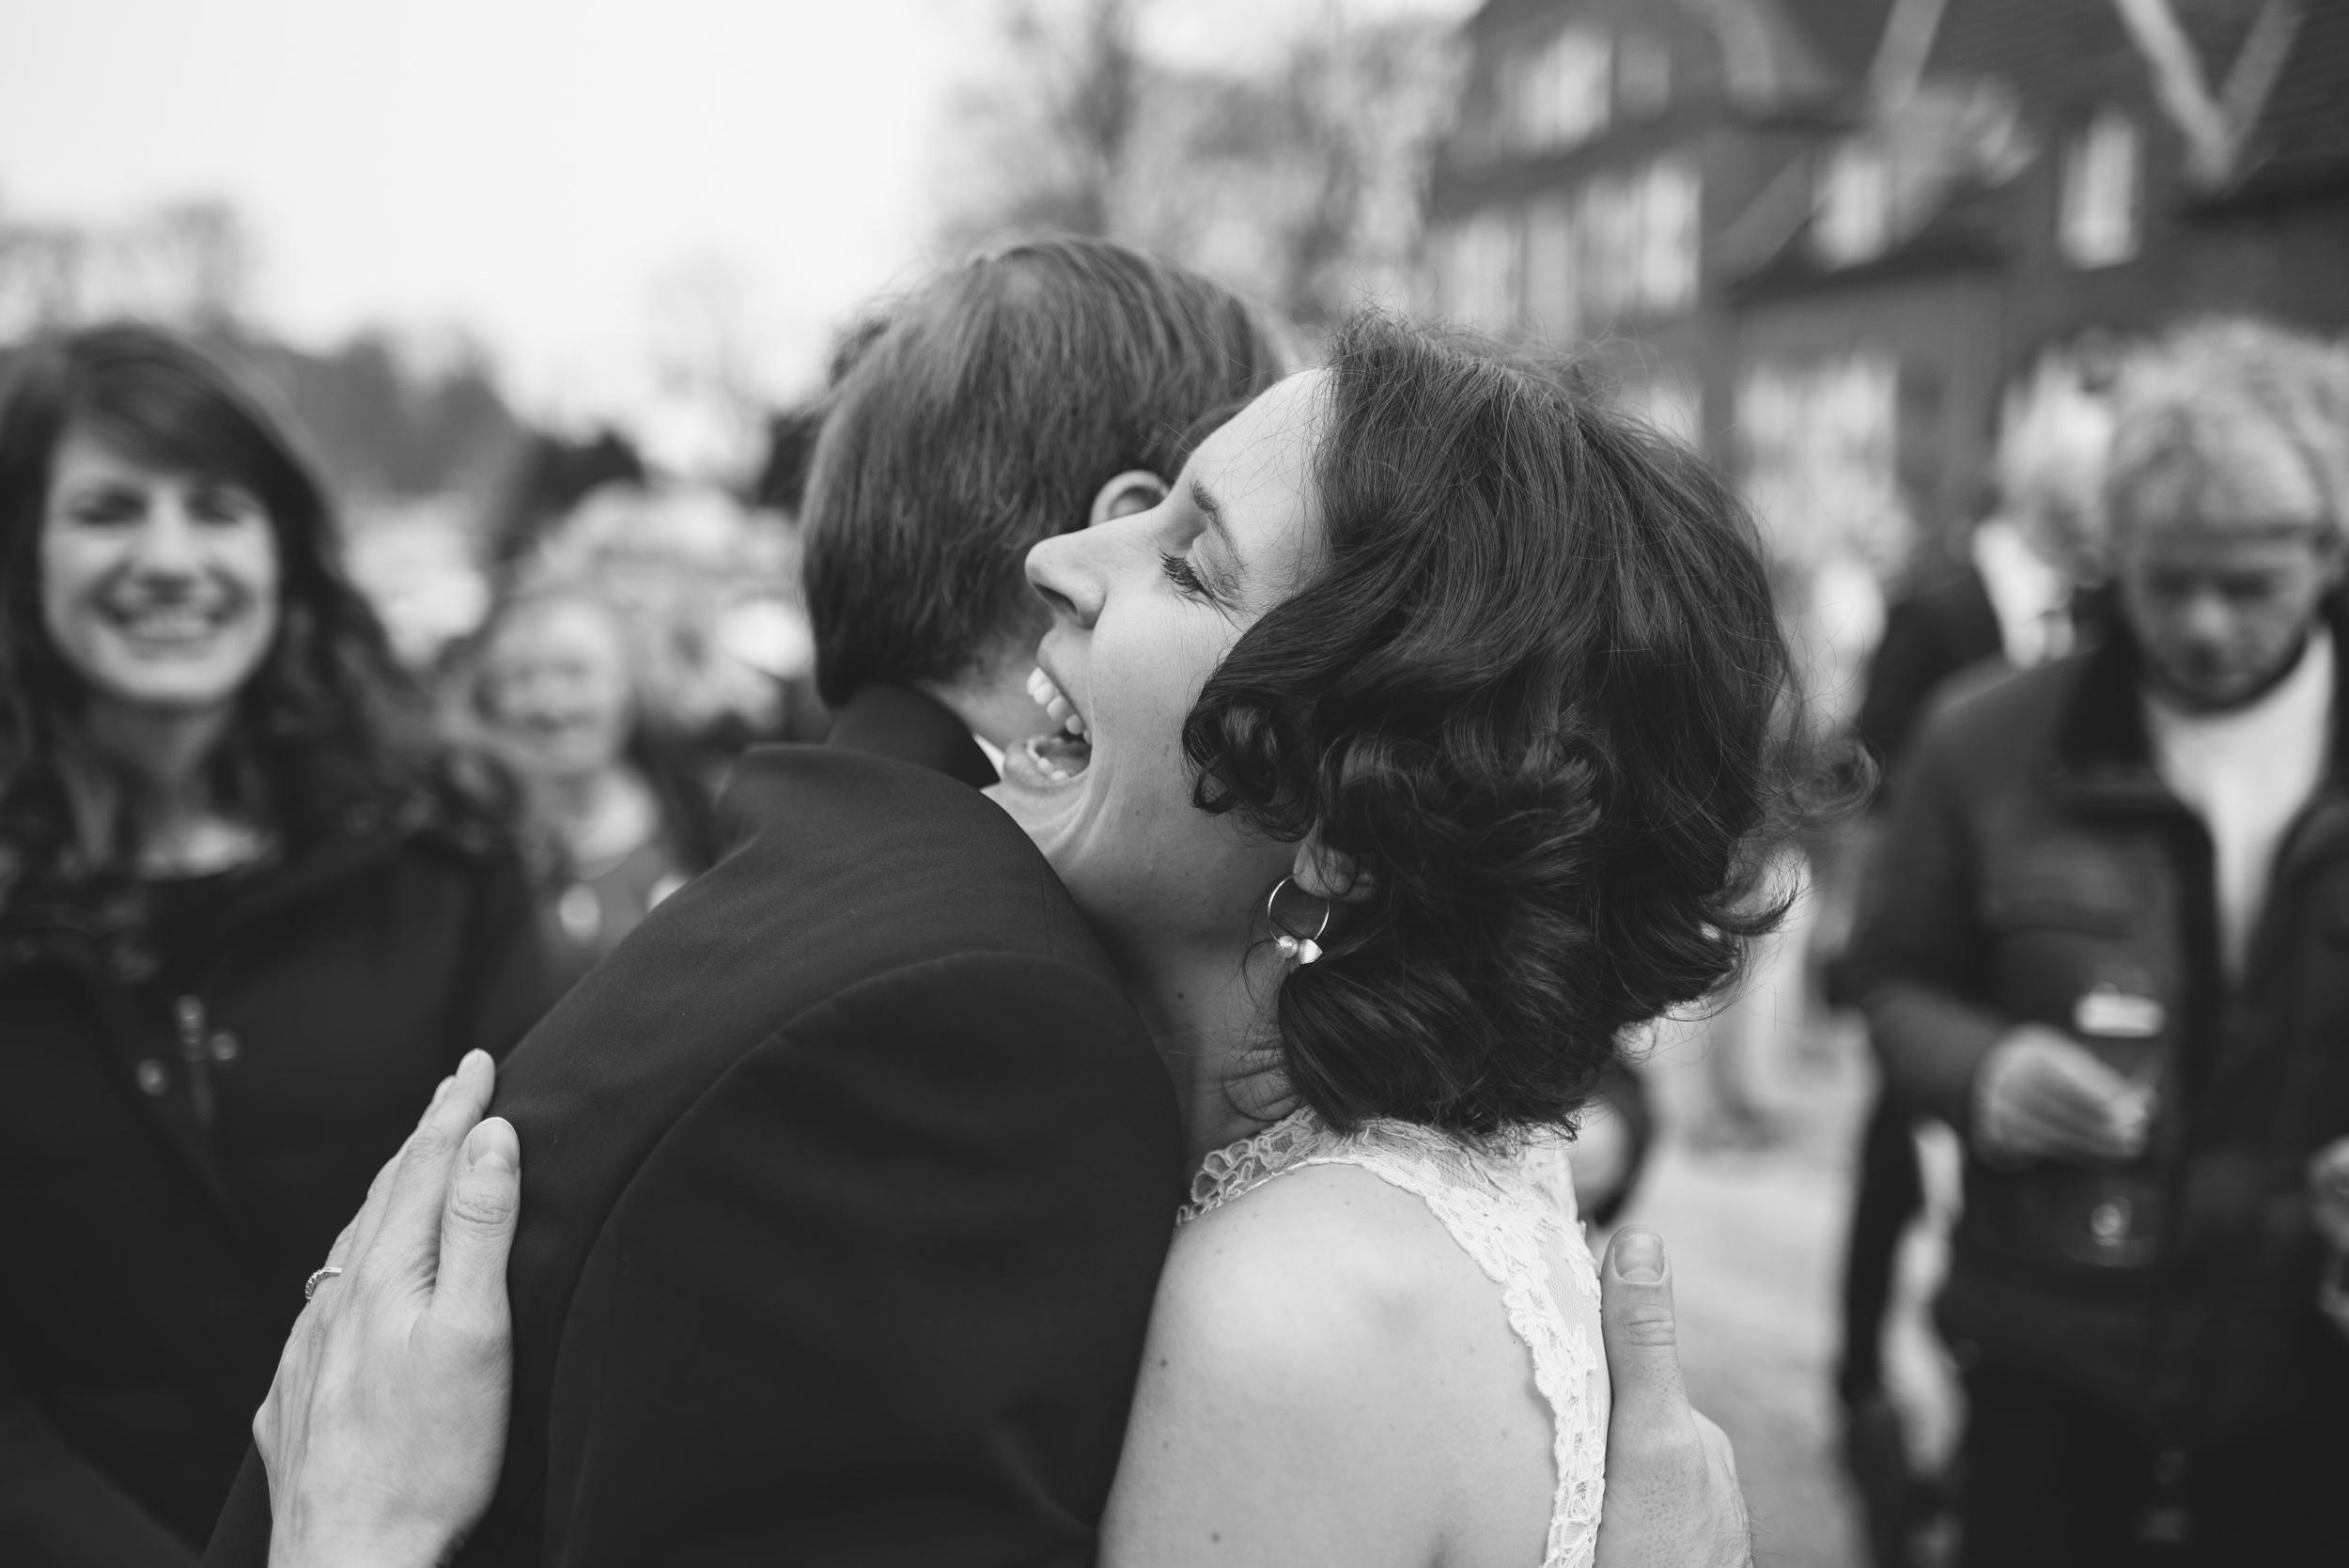 Hochzeitsfotograf-Schlossruine-Hertefeld-Weeze-092.jpg